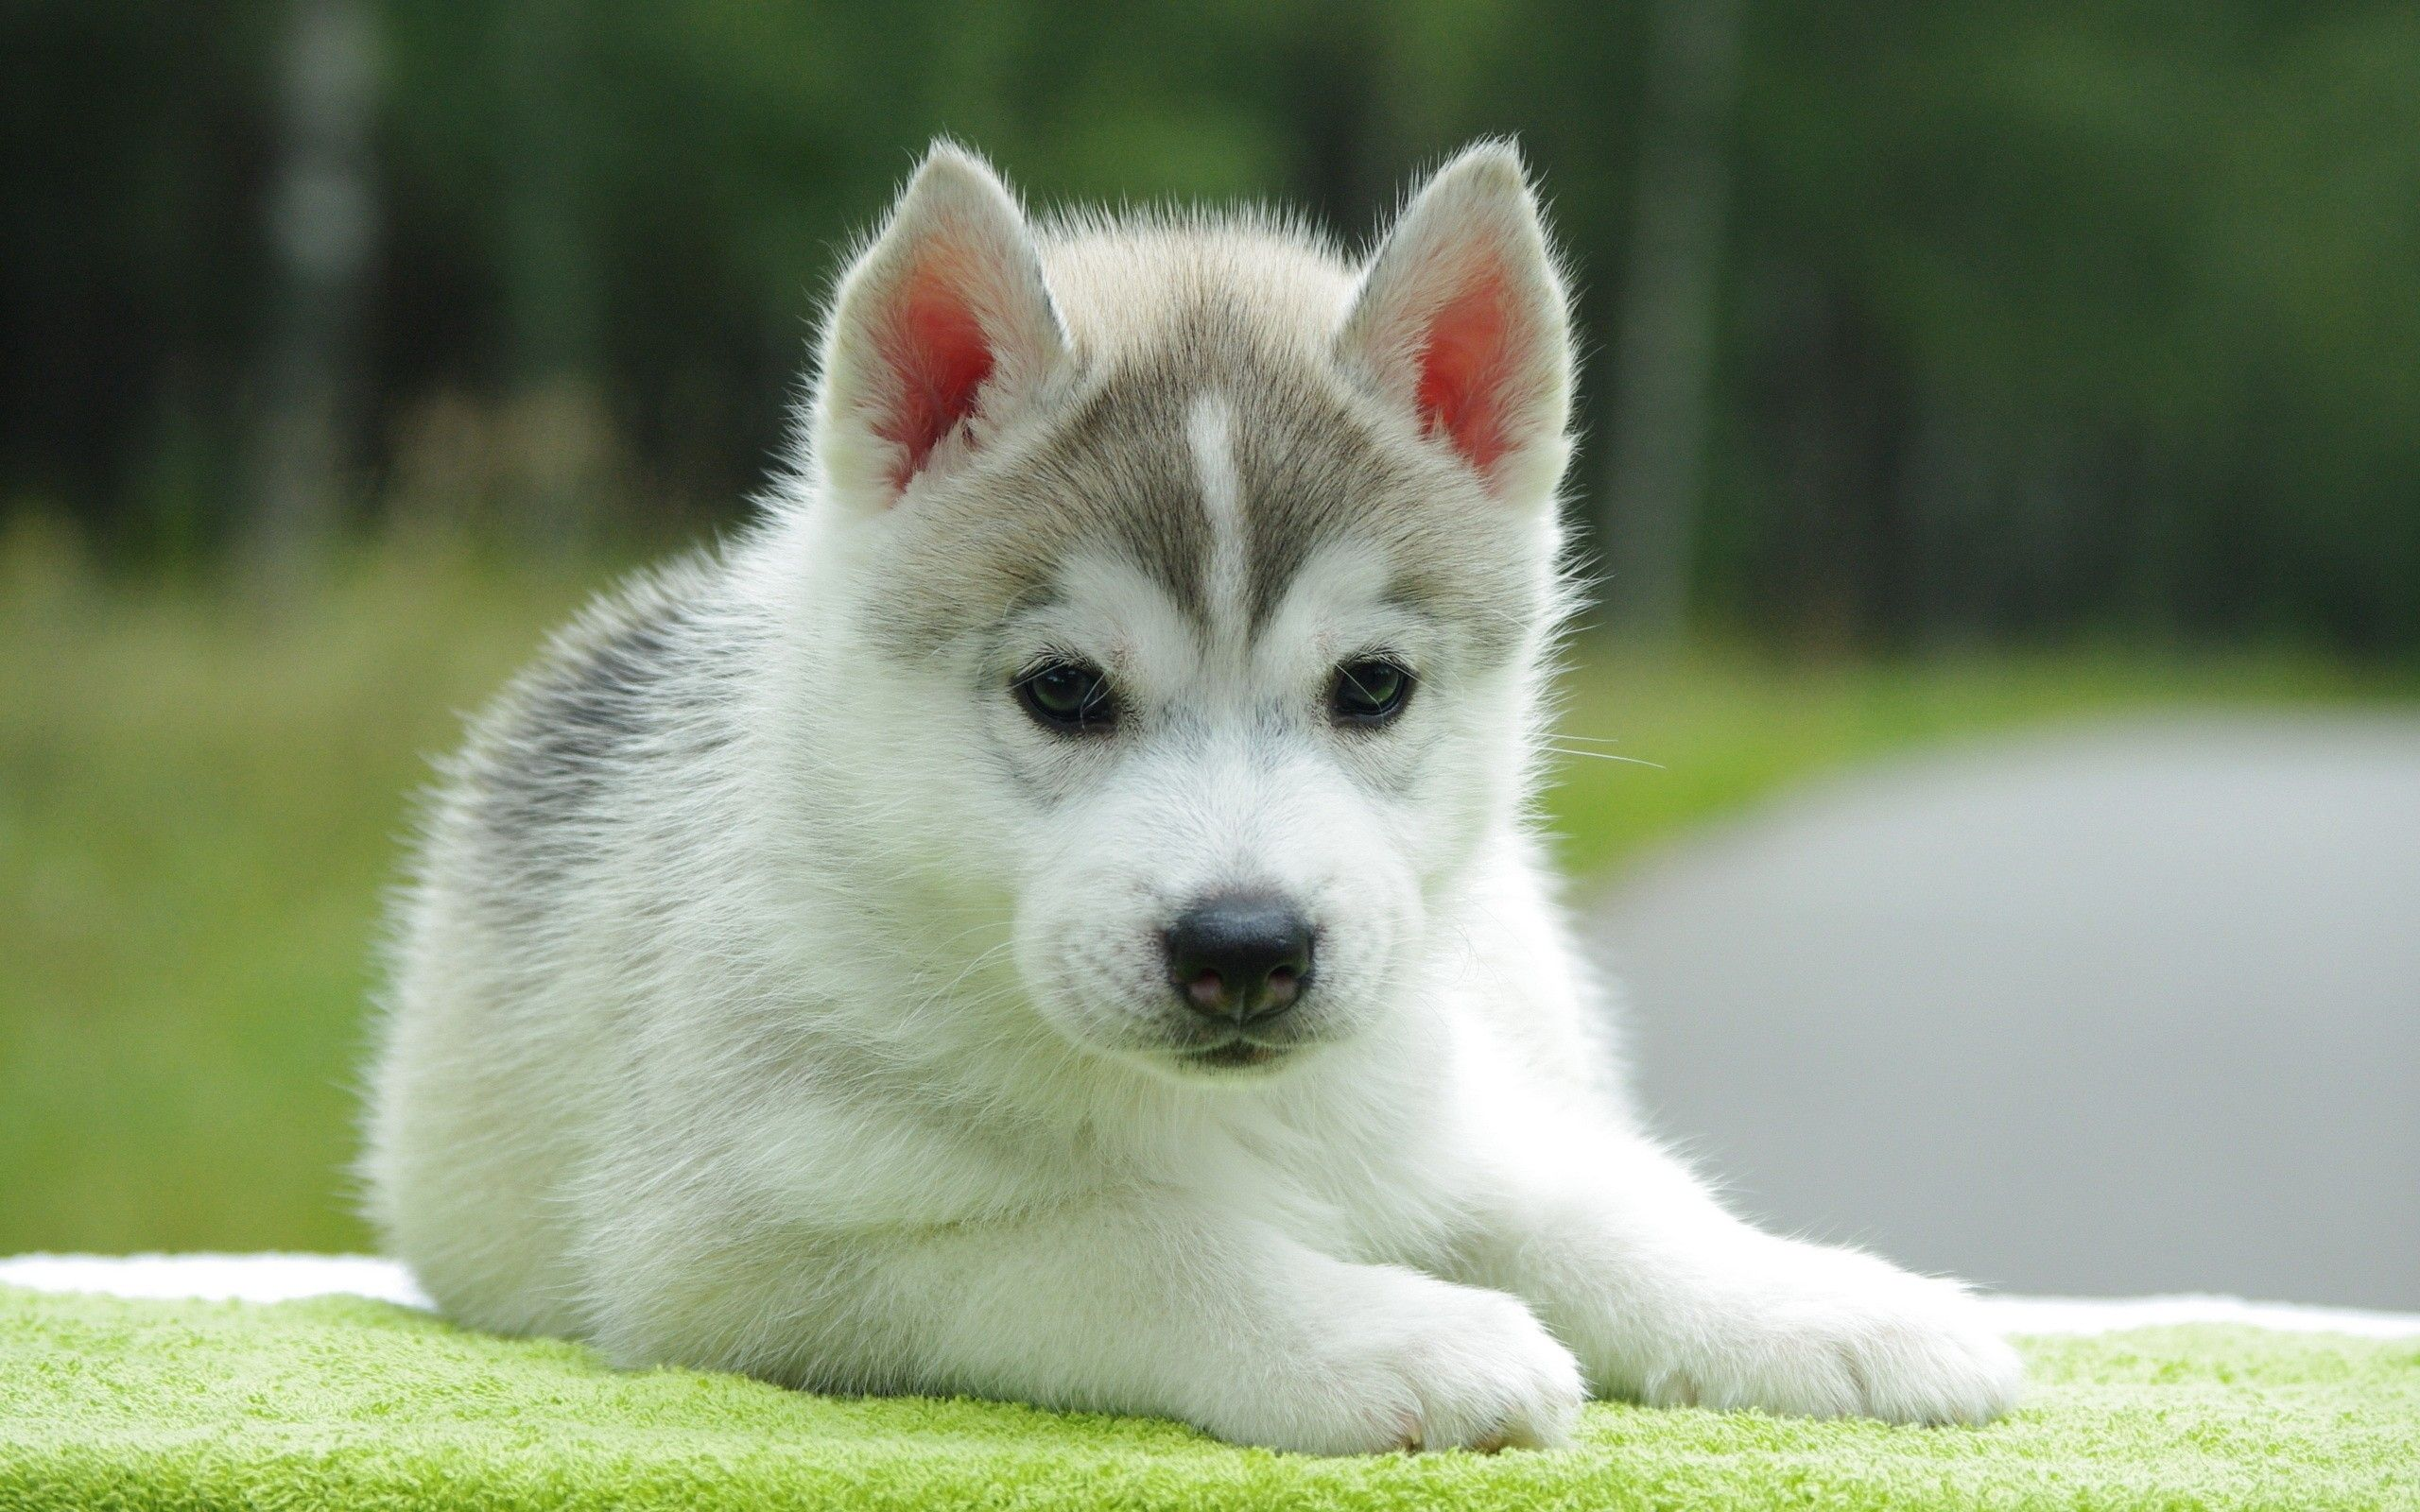 My Future Puppy Pomsky Puppies Cute Husky Puppies Cute Animals